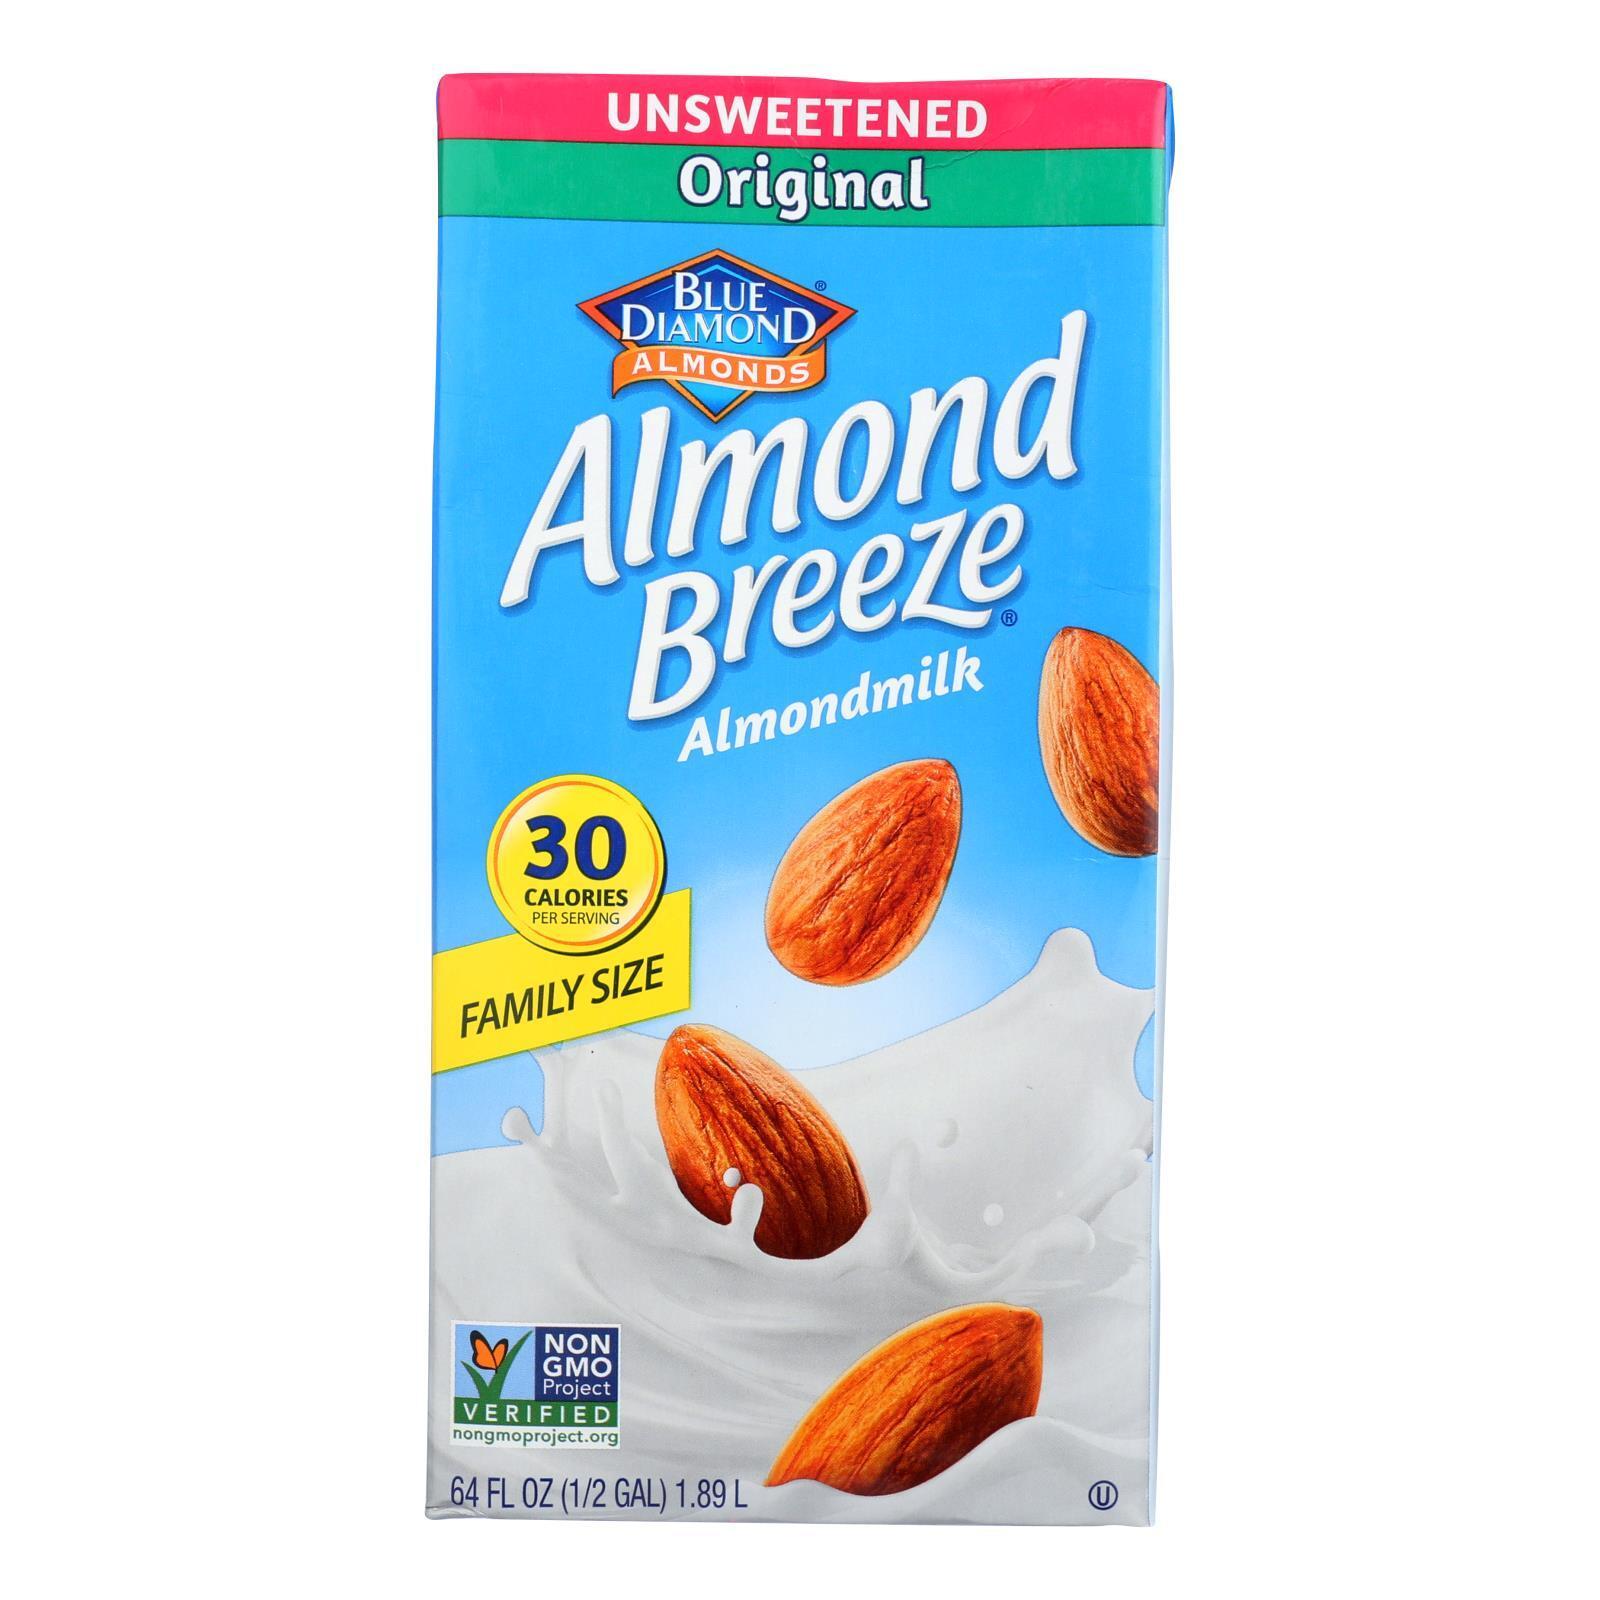 Almond Breeze Unsweetened Original Almond Breeze - Case of 8 - 64 fl oz